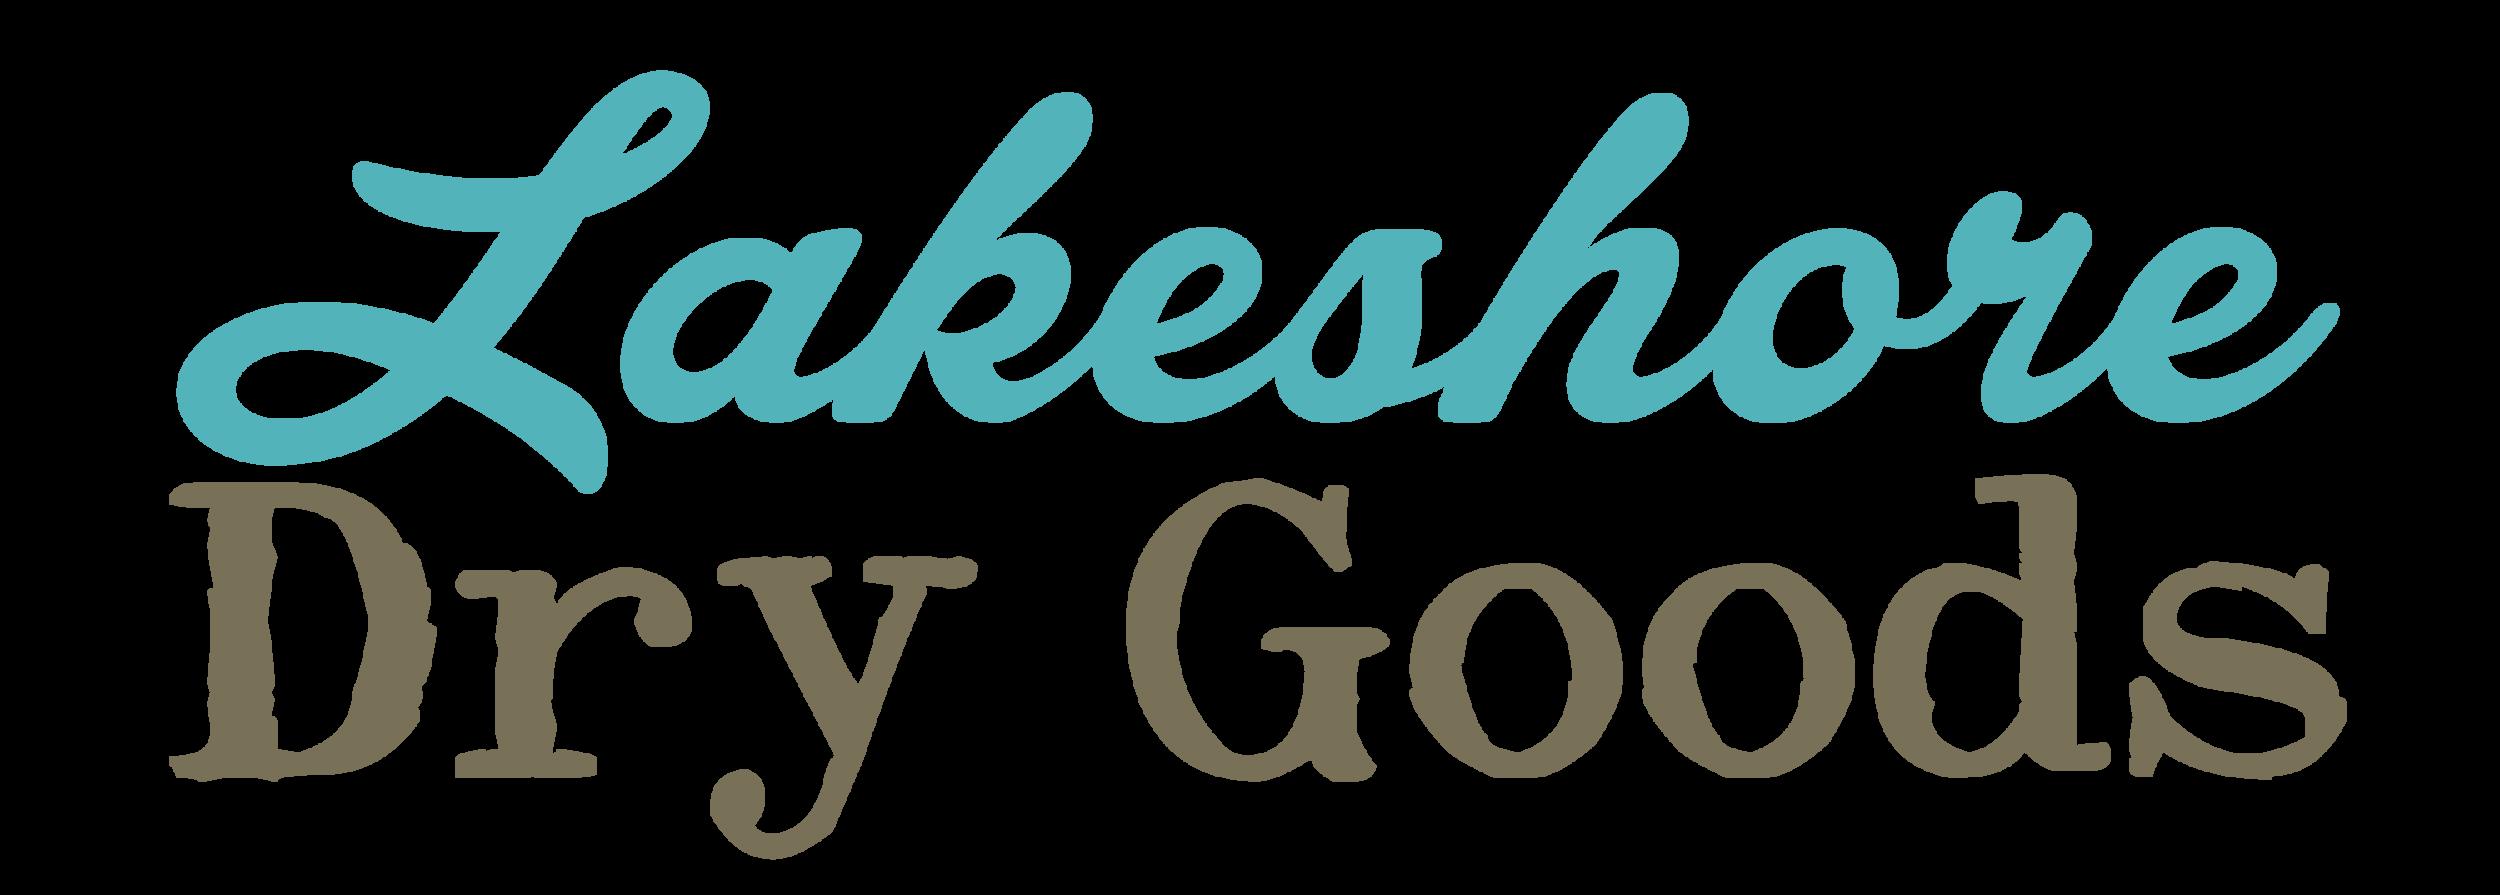 Lakeshore Dry Goods_lg(1).png